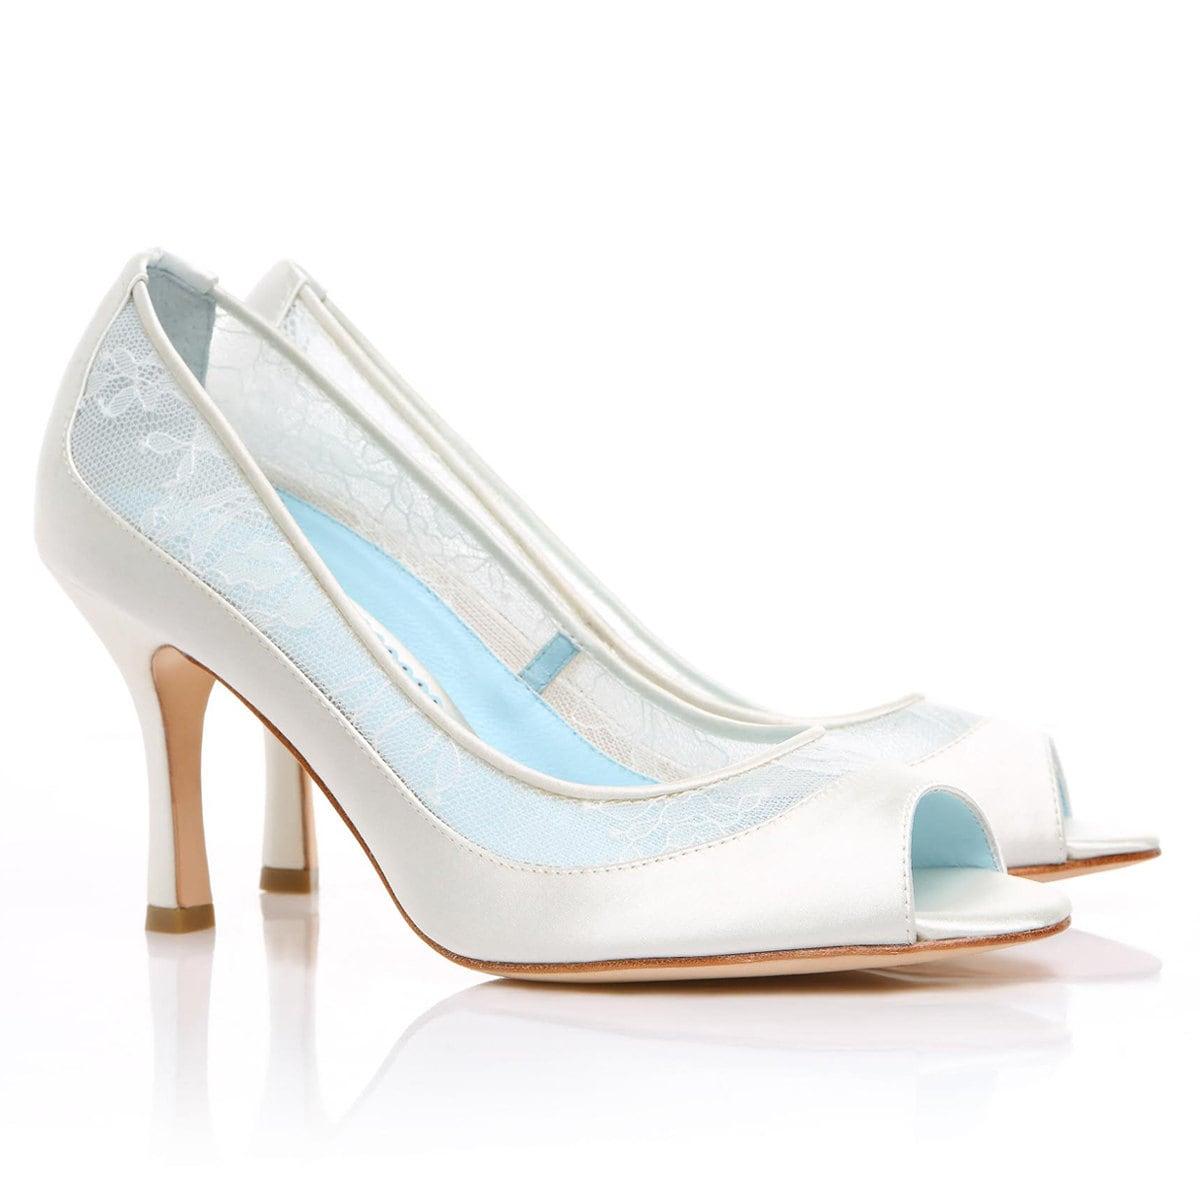 Lace Wedding Shoes Low Heel: Dyeable Lace Wedding Shoes Low Heel Diamond White Peep Toe